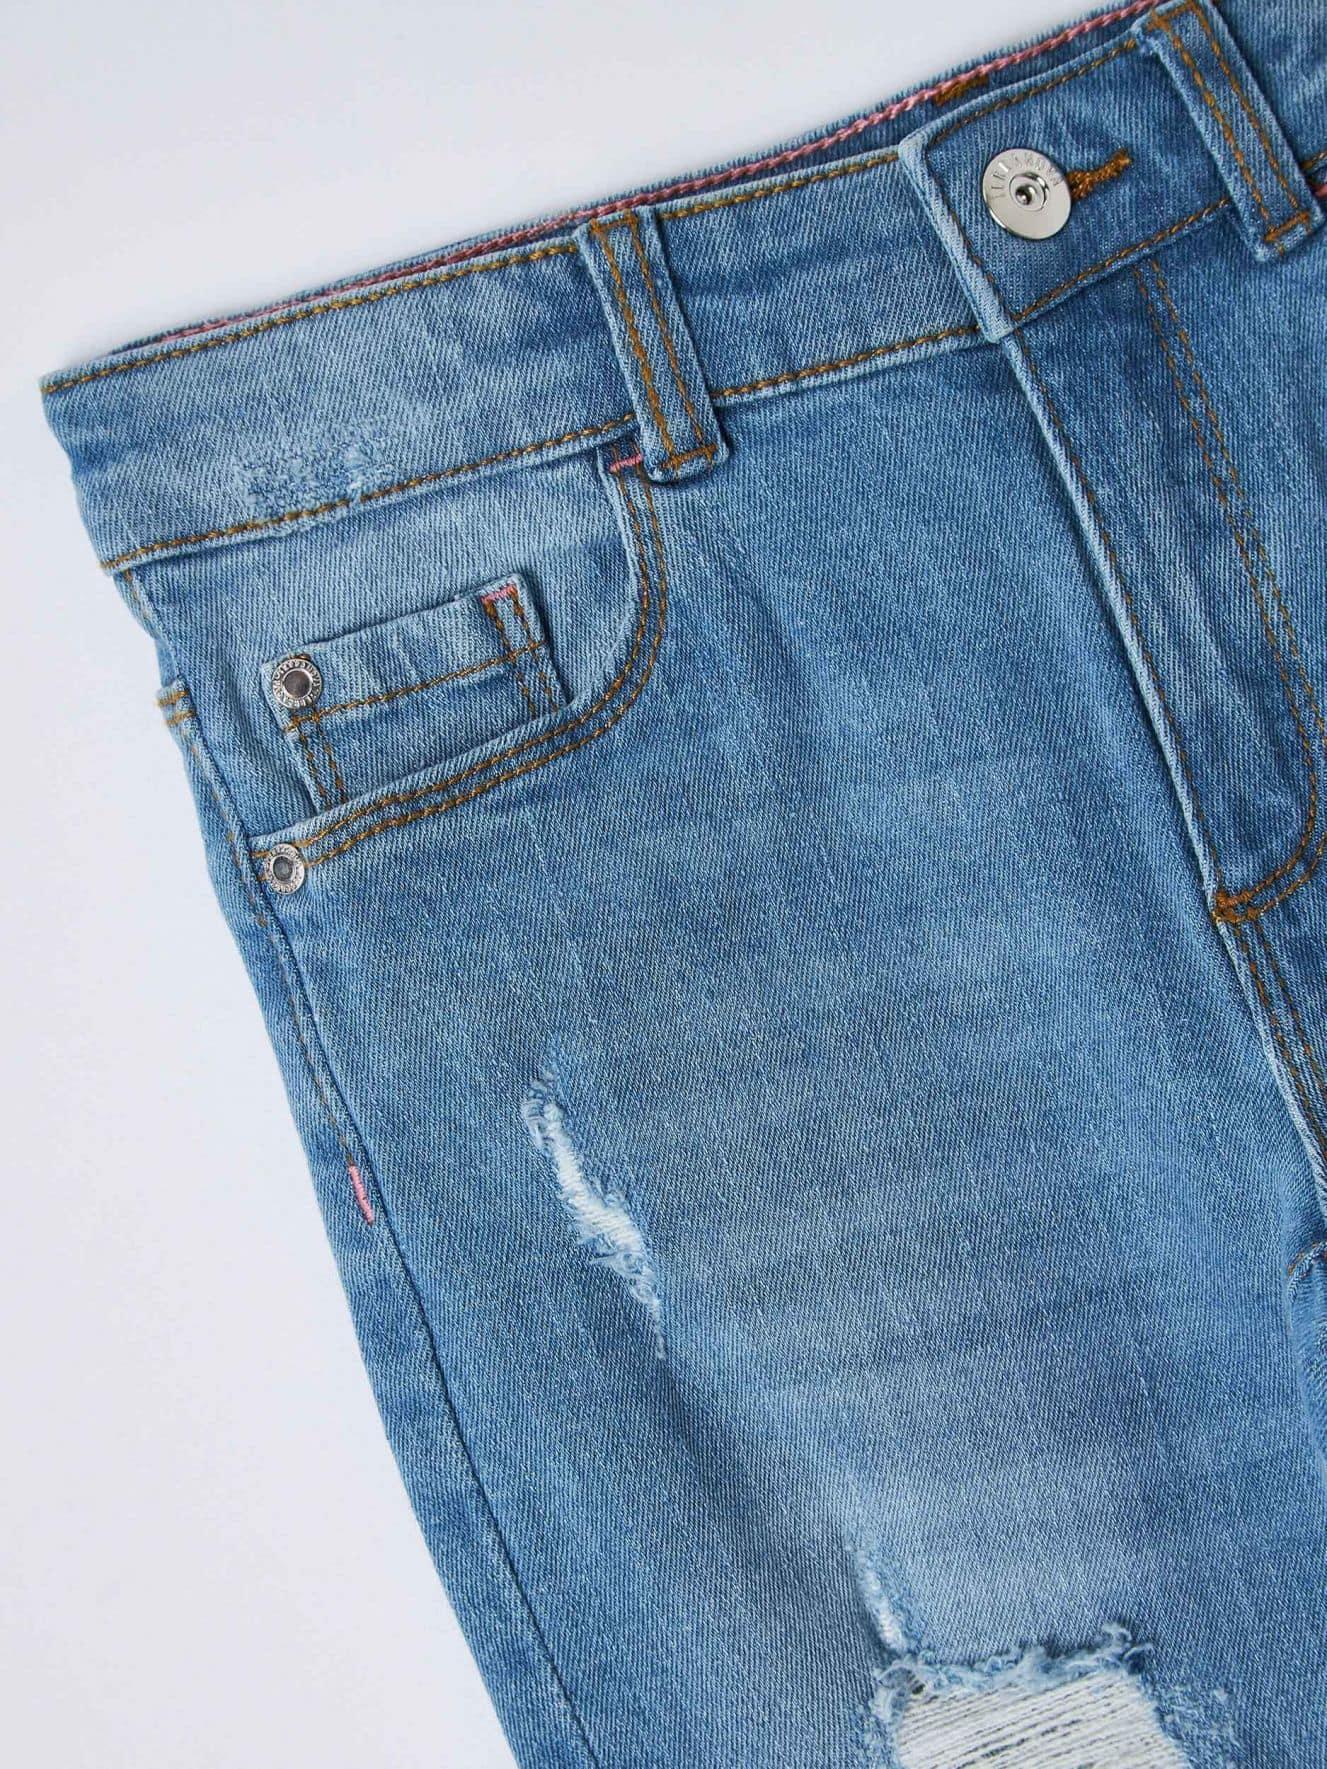 Pantalone Jeans Lungo Детски дрехи за момичета 010